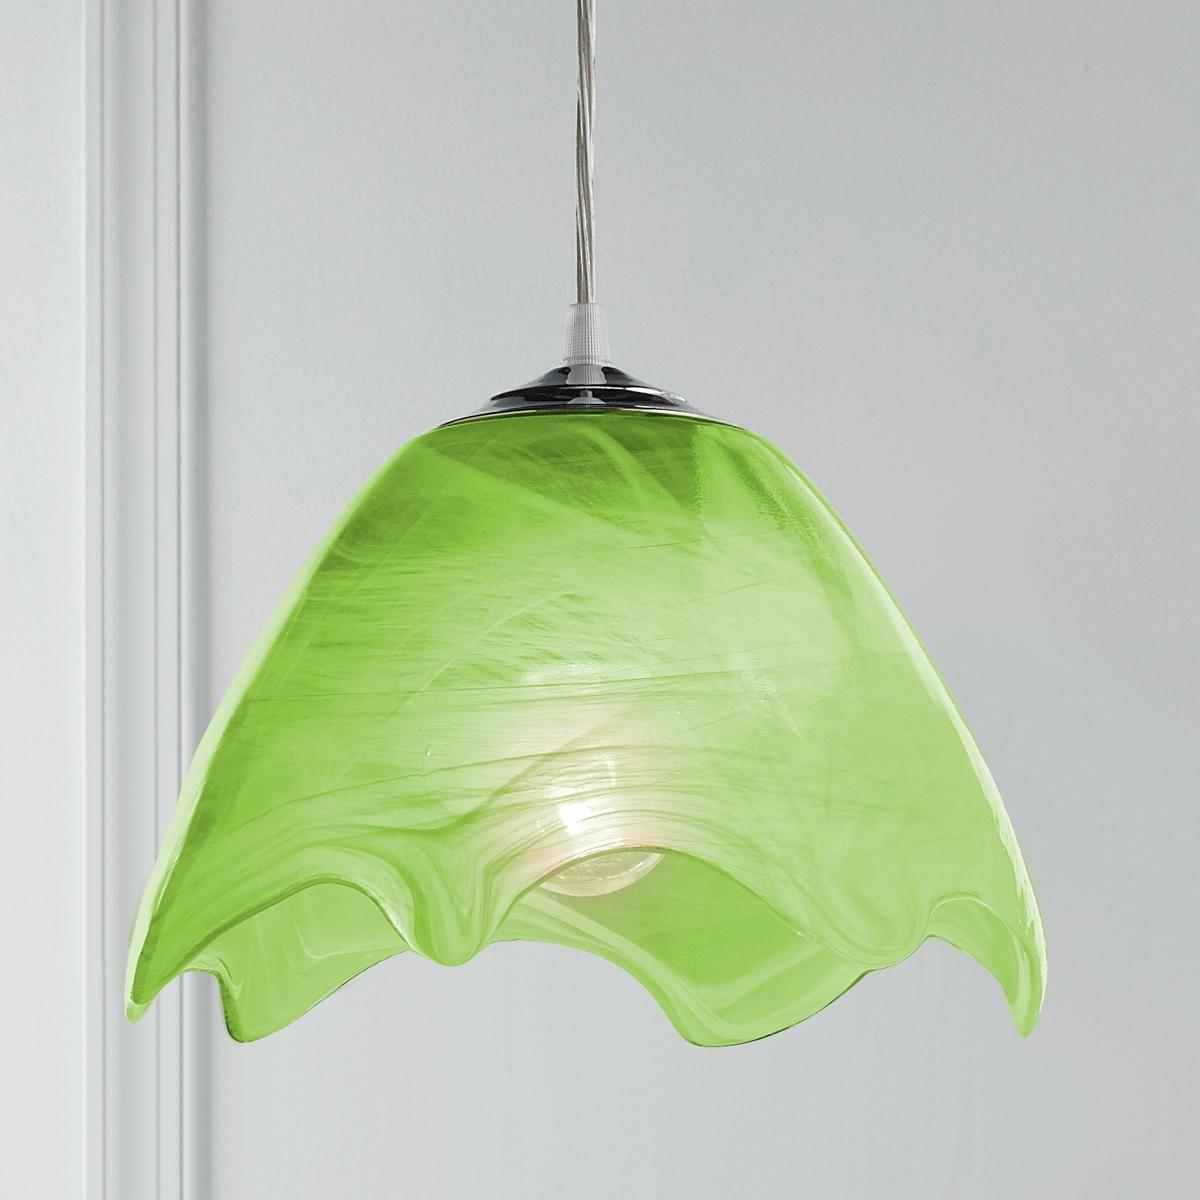 Wavy glass pendant light glass pendants pendant lighting and pendants wavy glass pendant light arubaitofo Image collections